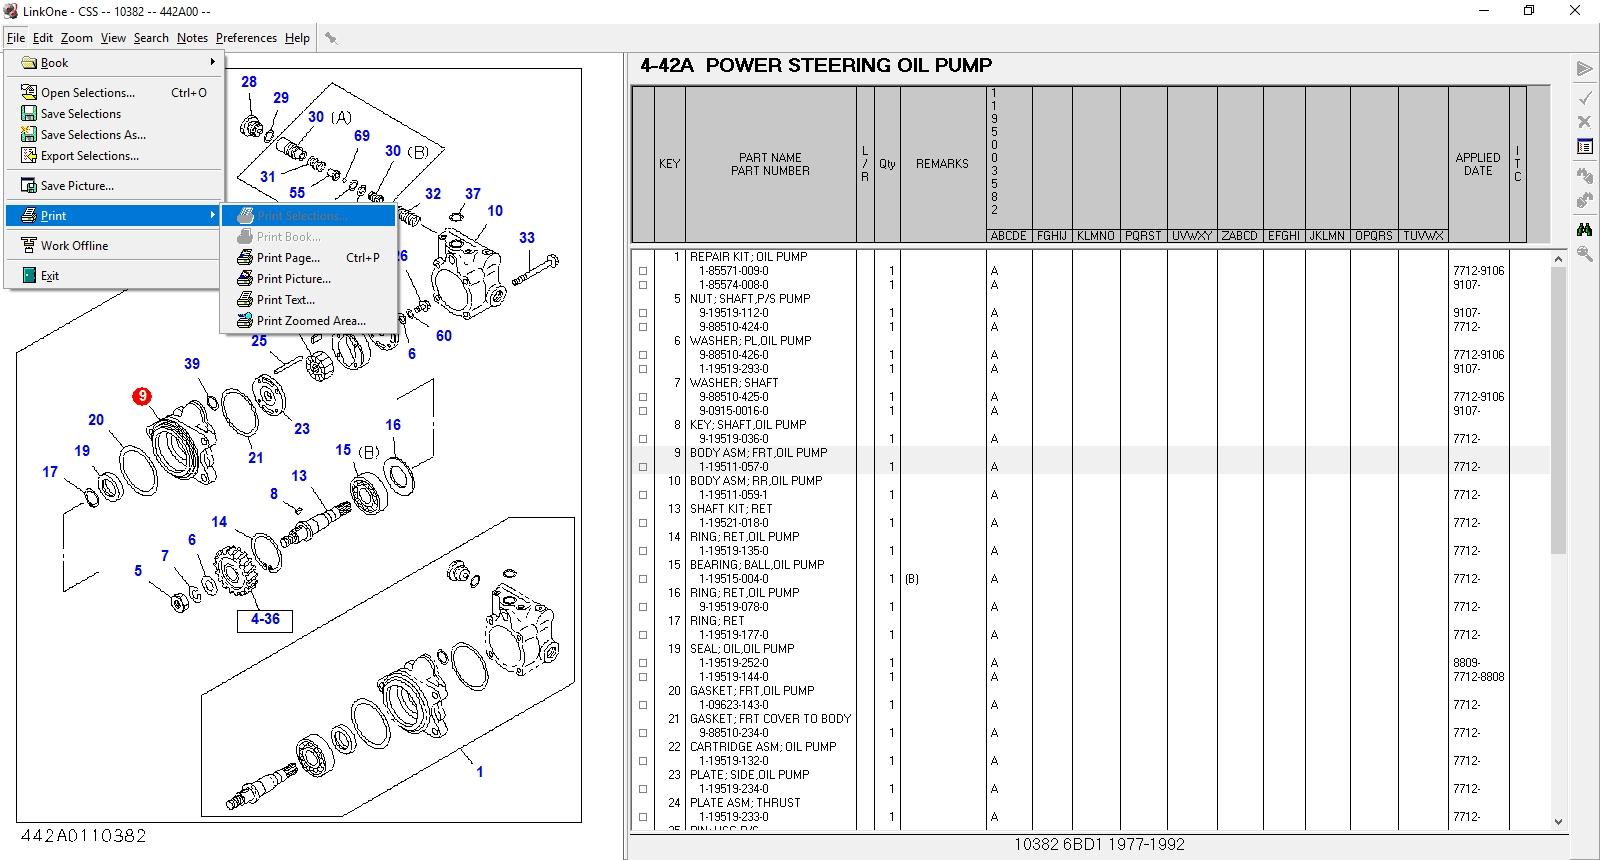 ISUZU_CSS-NET_EPC_052020_Electronic_Parts_Catalog_5